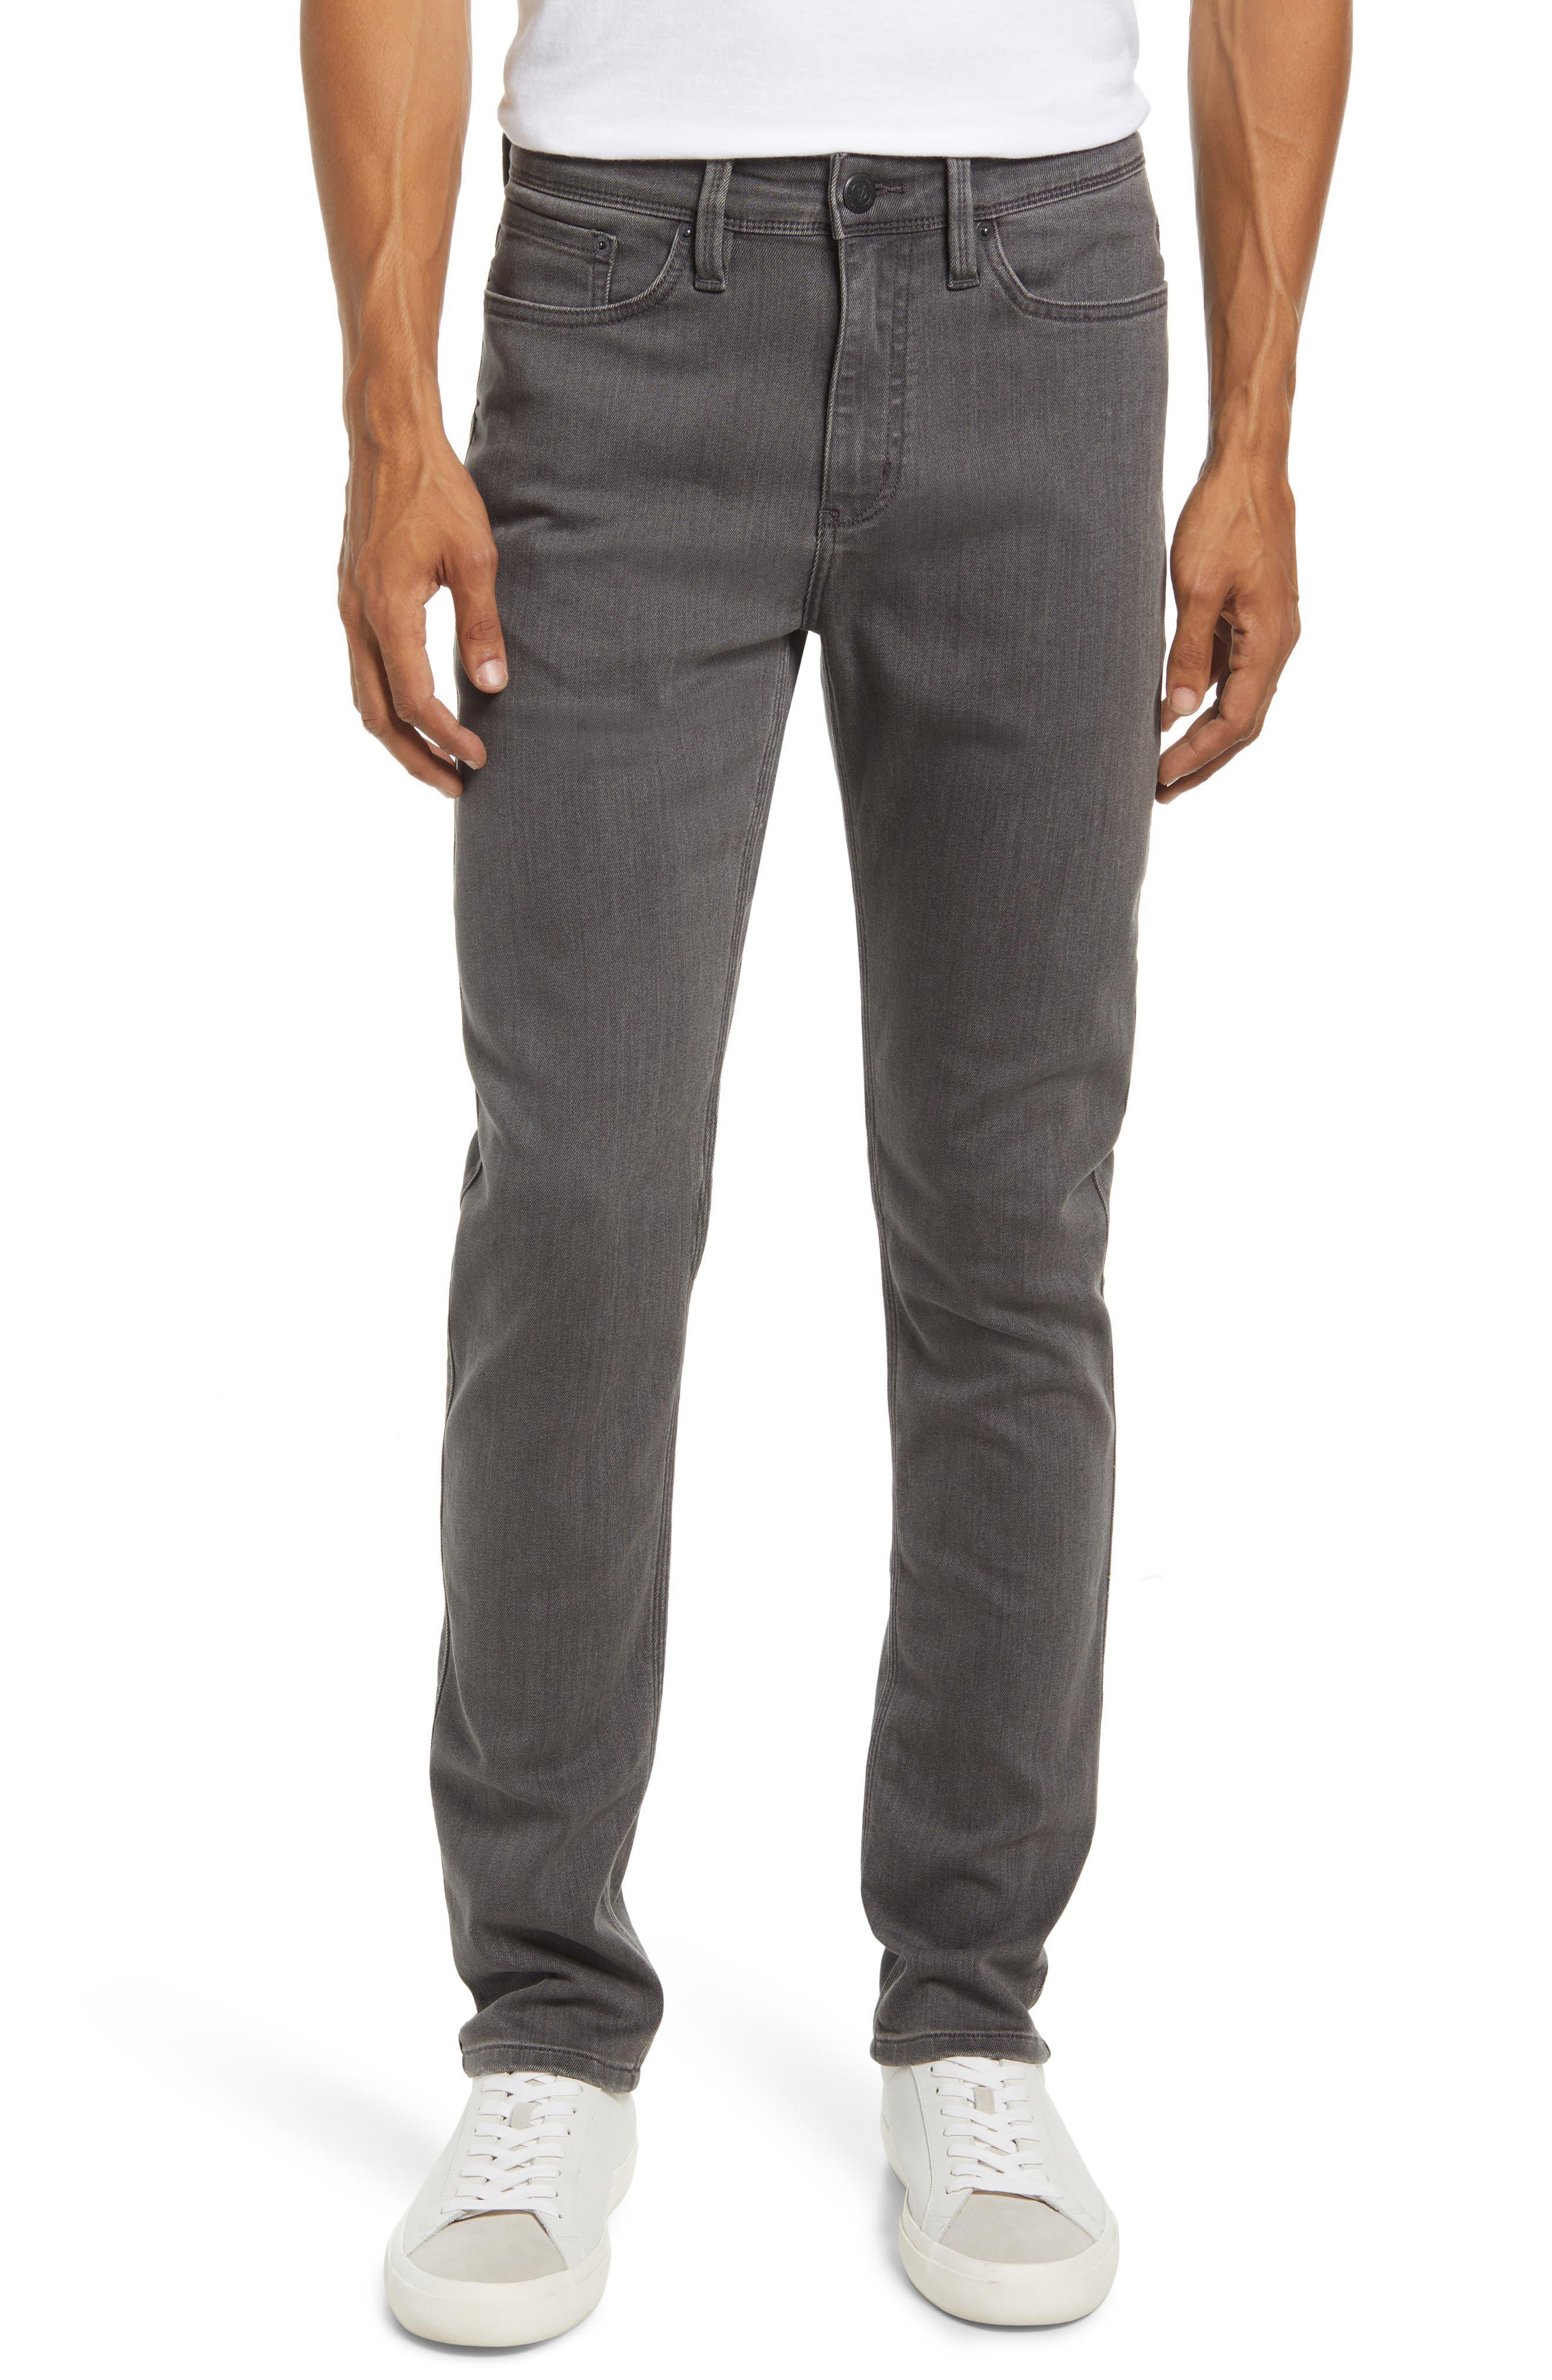 Performance Slim Fit Jeans